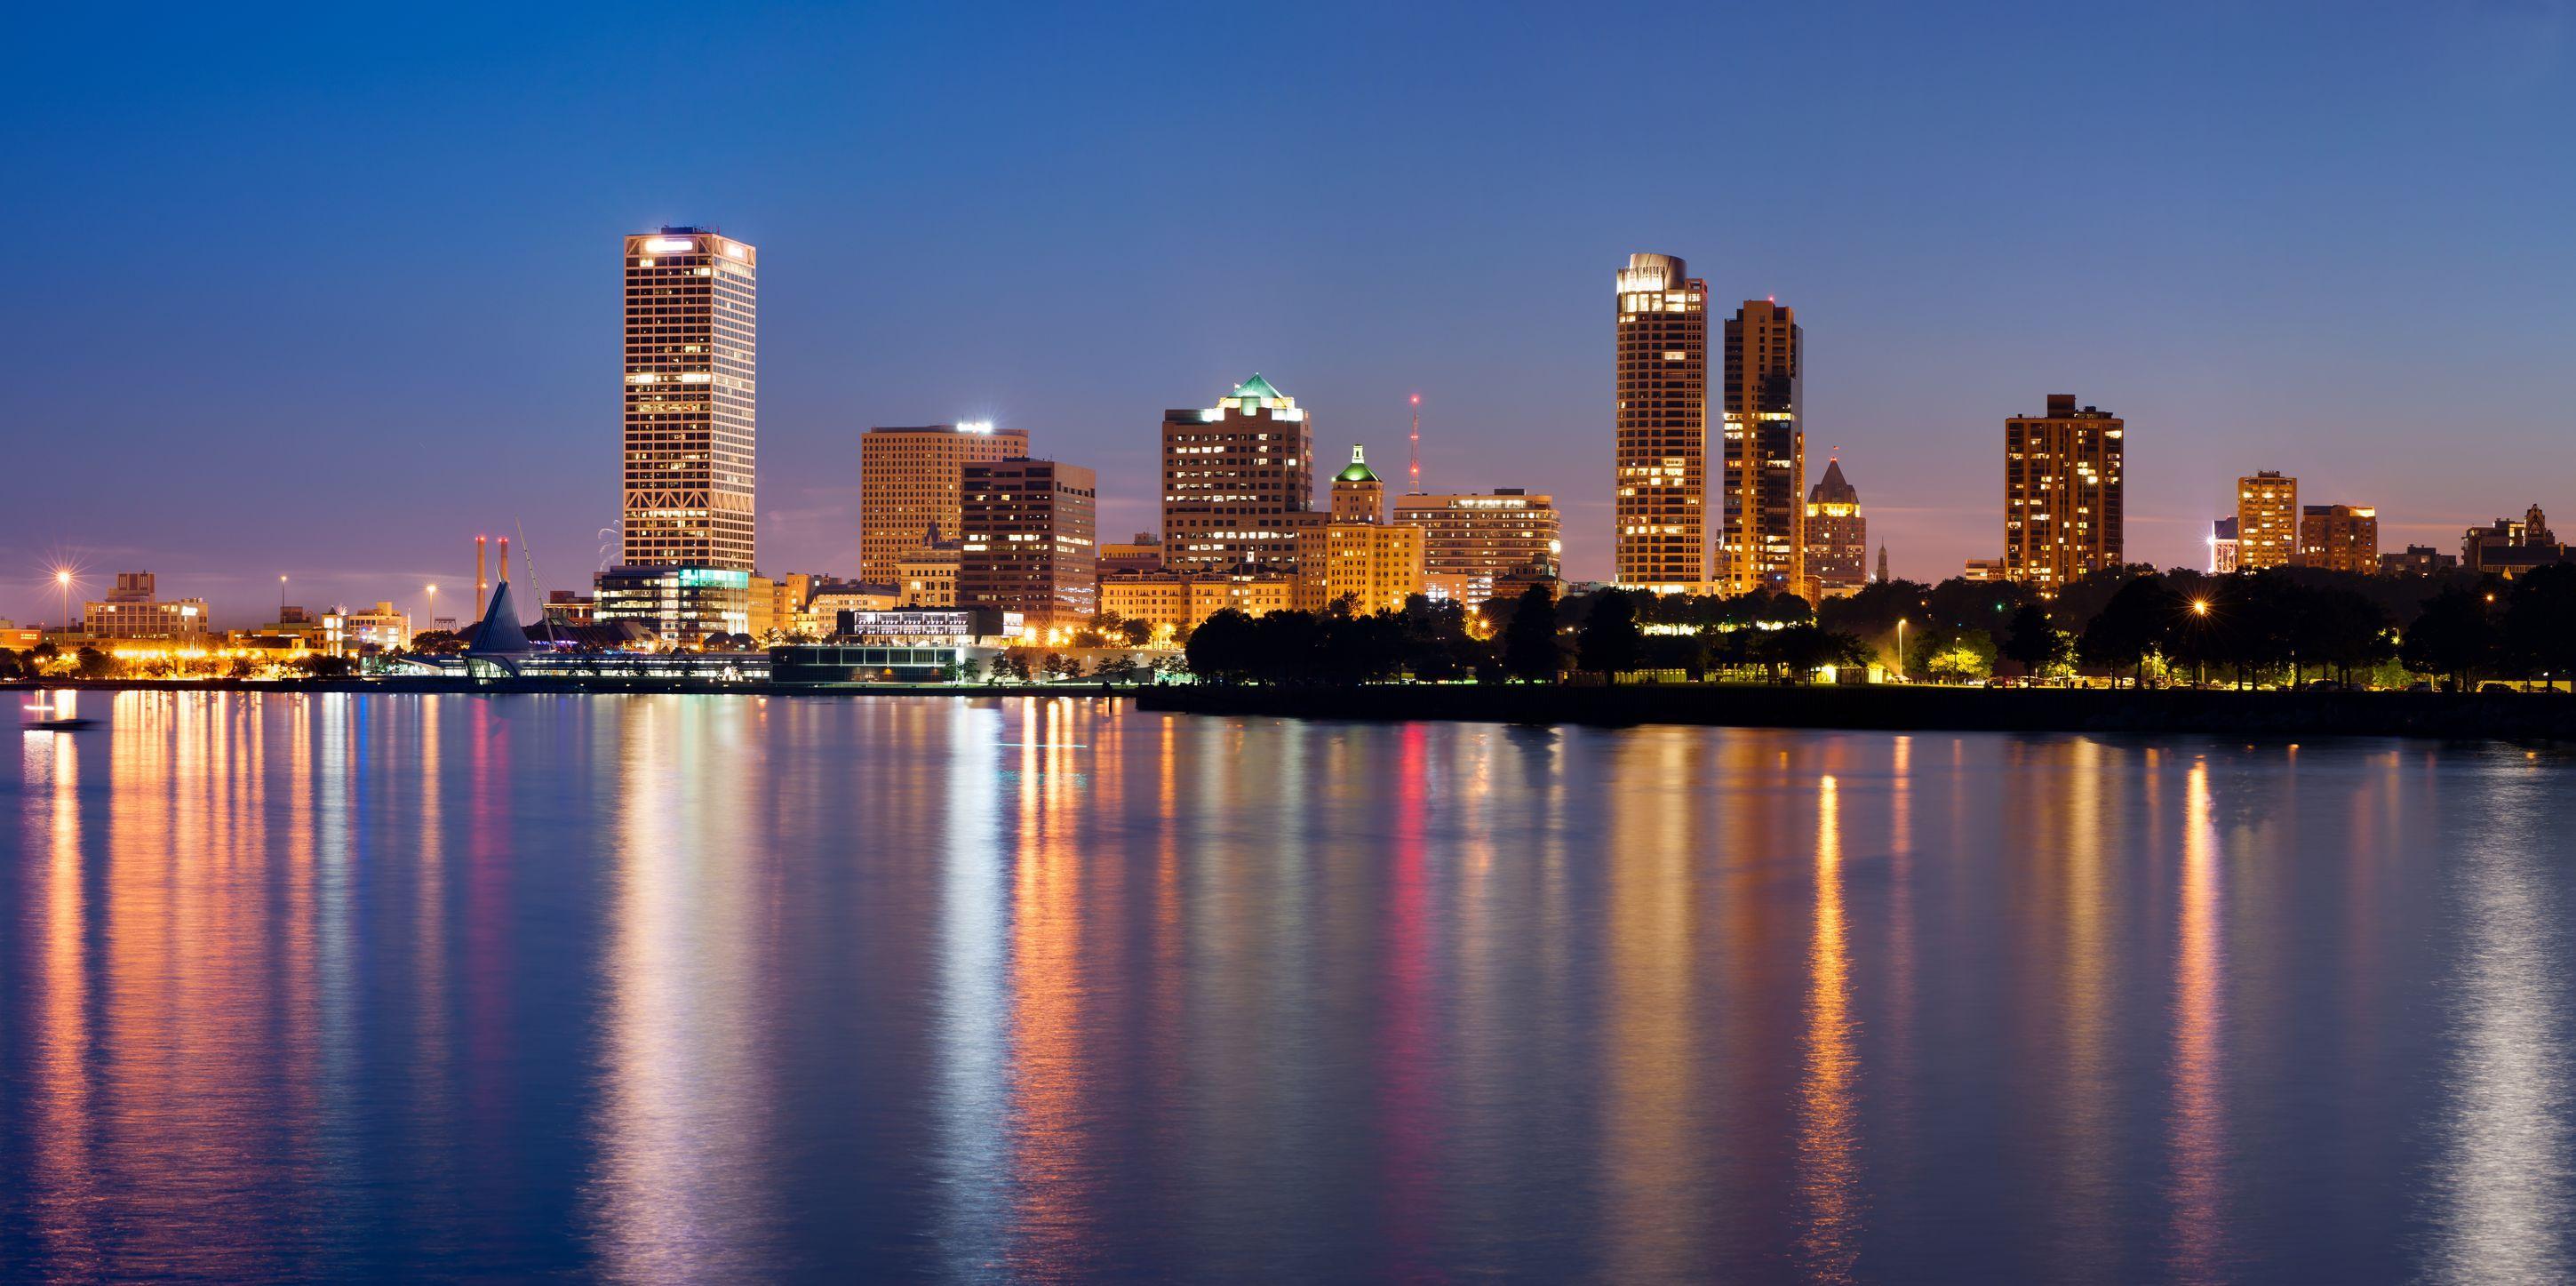 7 Reasons Why I Love The City Of Milwaukee Milwaukee Skyline Milwaukee City Skyline